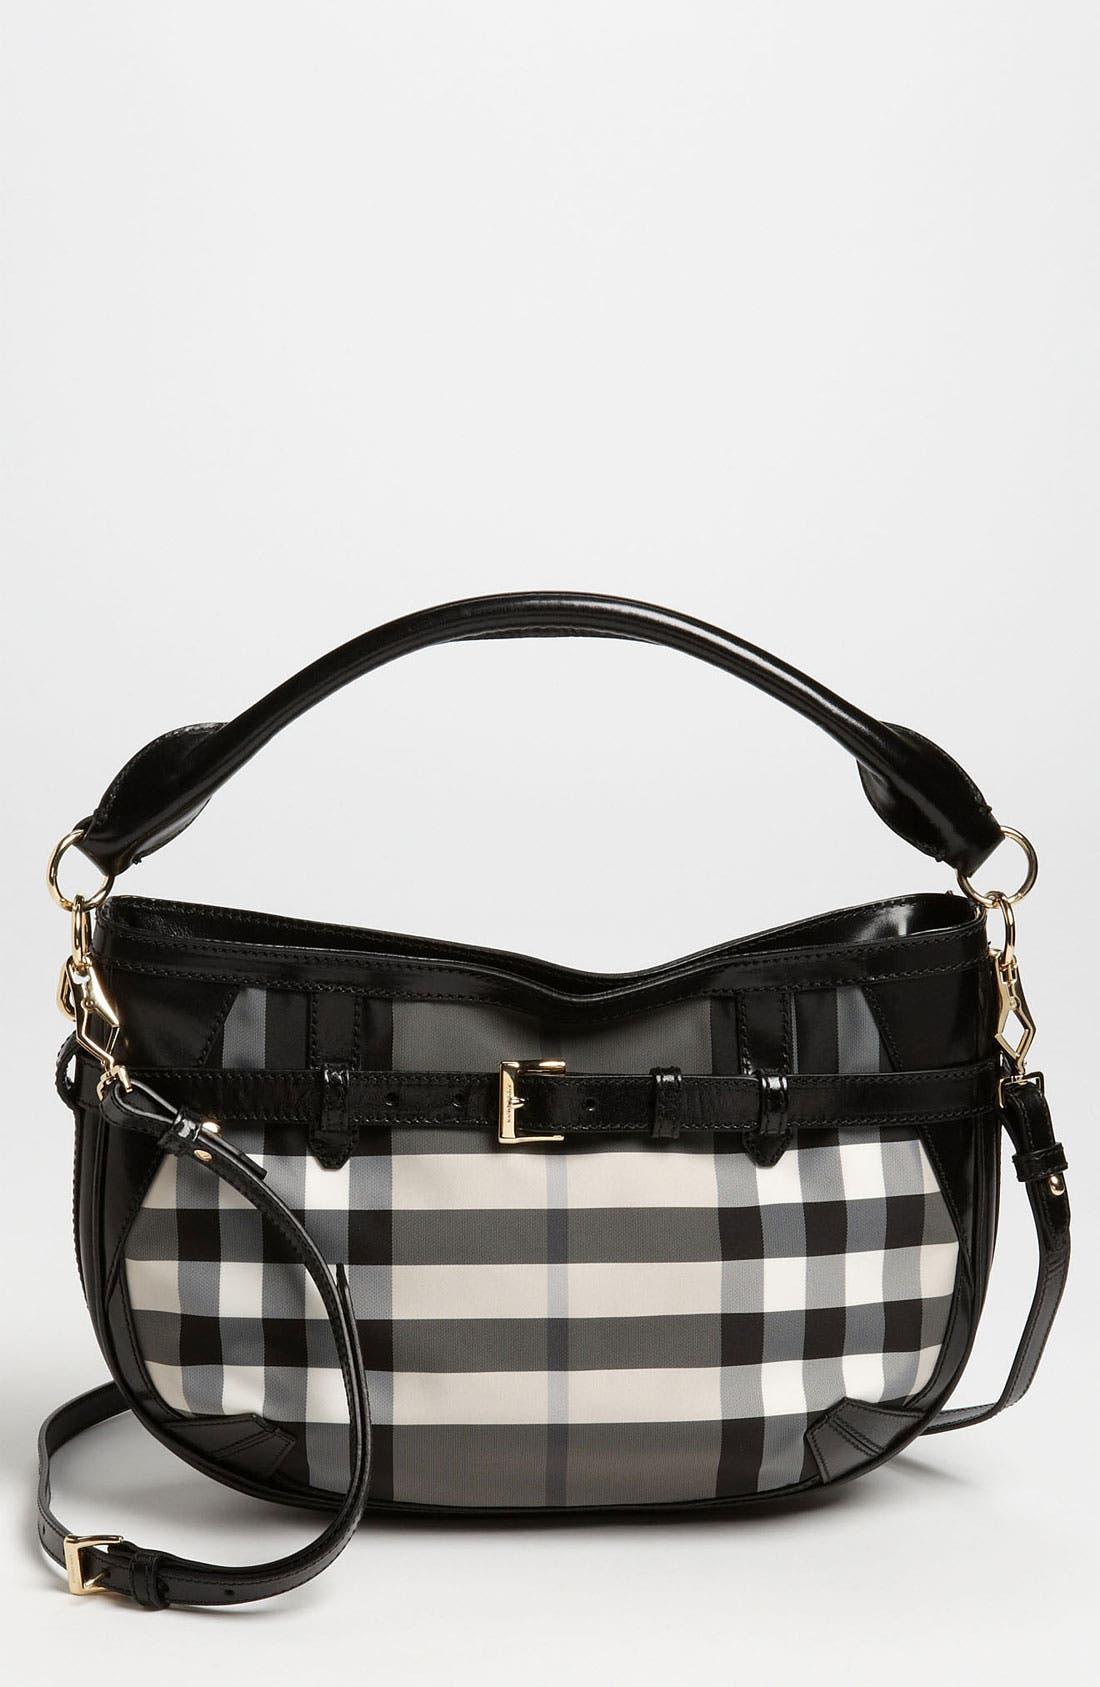 Main Image - Burberry Prorsum 'Charcoal Check' Crossbody Bag